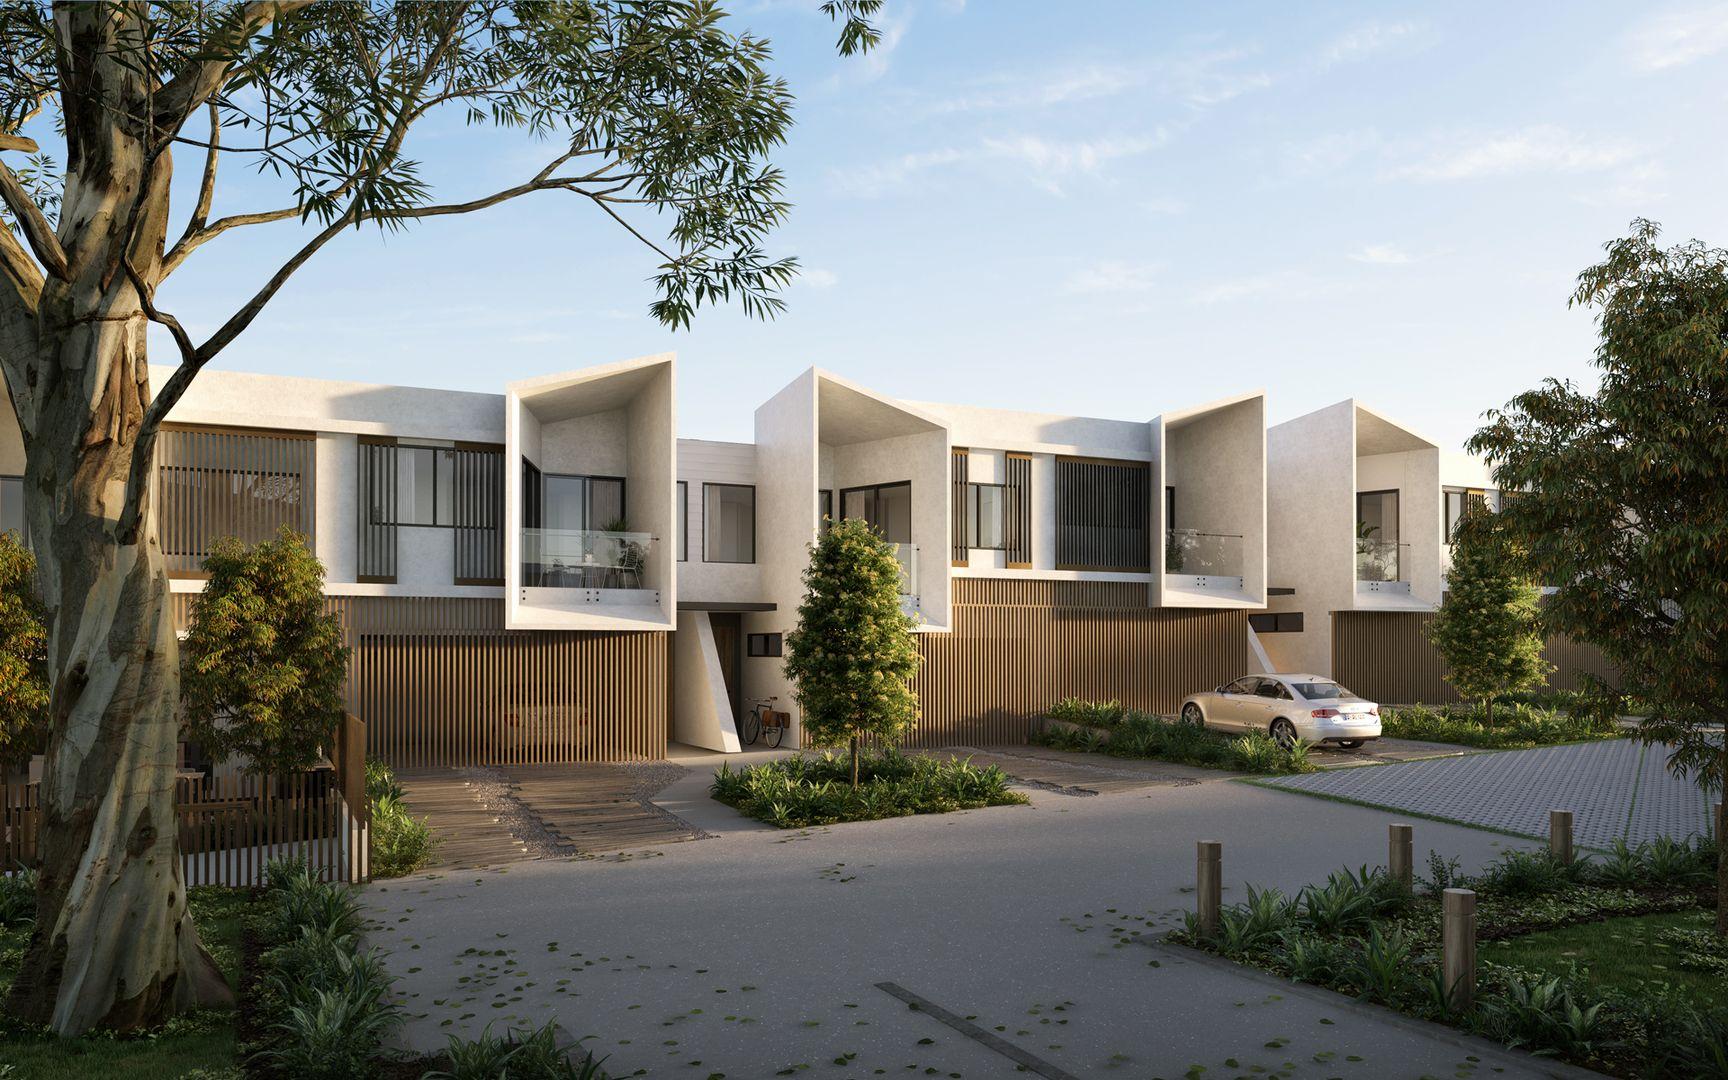 42-50 Merlin  Terrace, Kenmore QLD 4069, Image 0